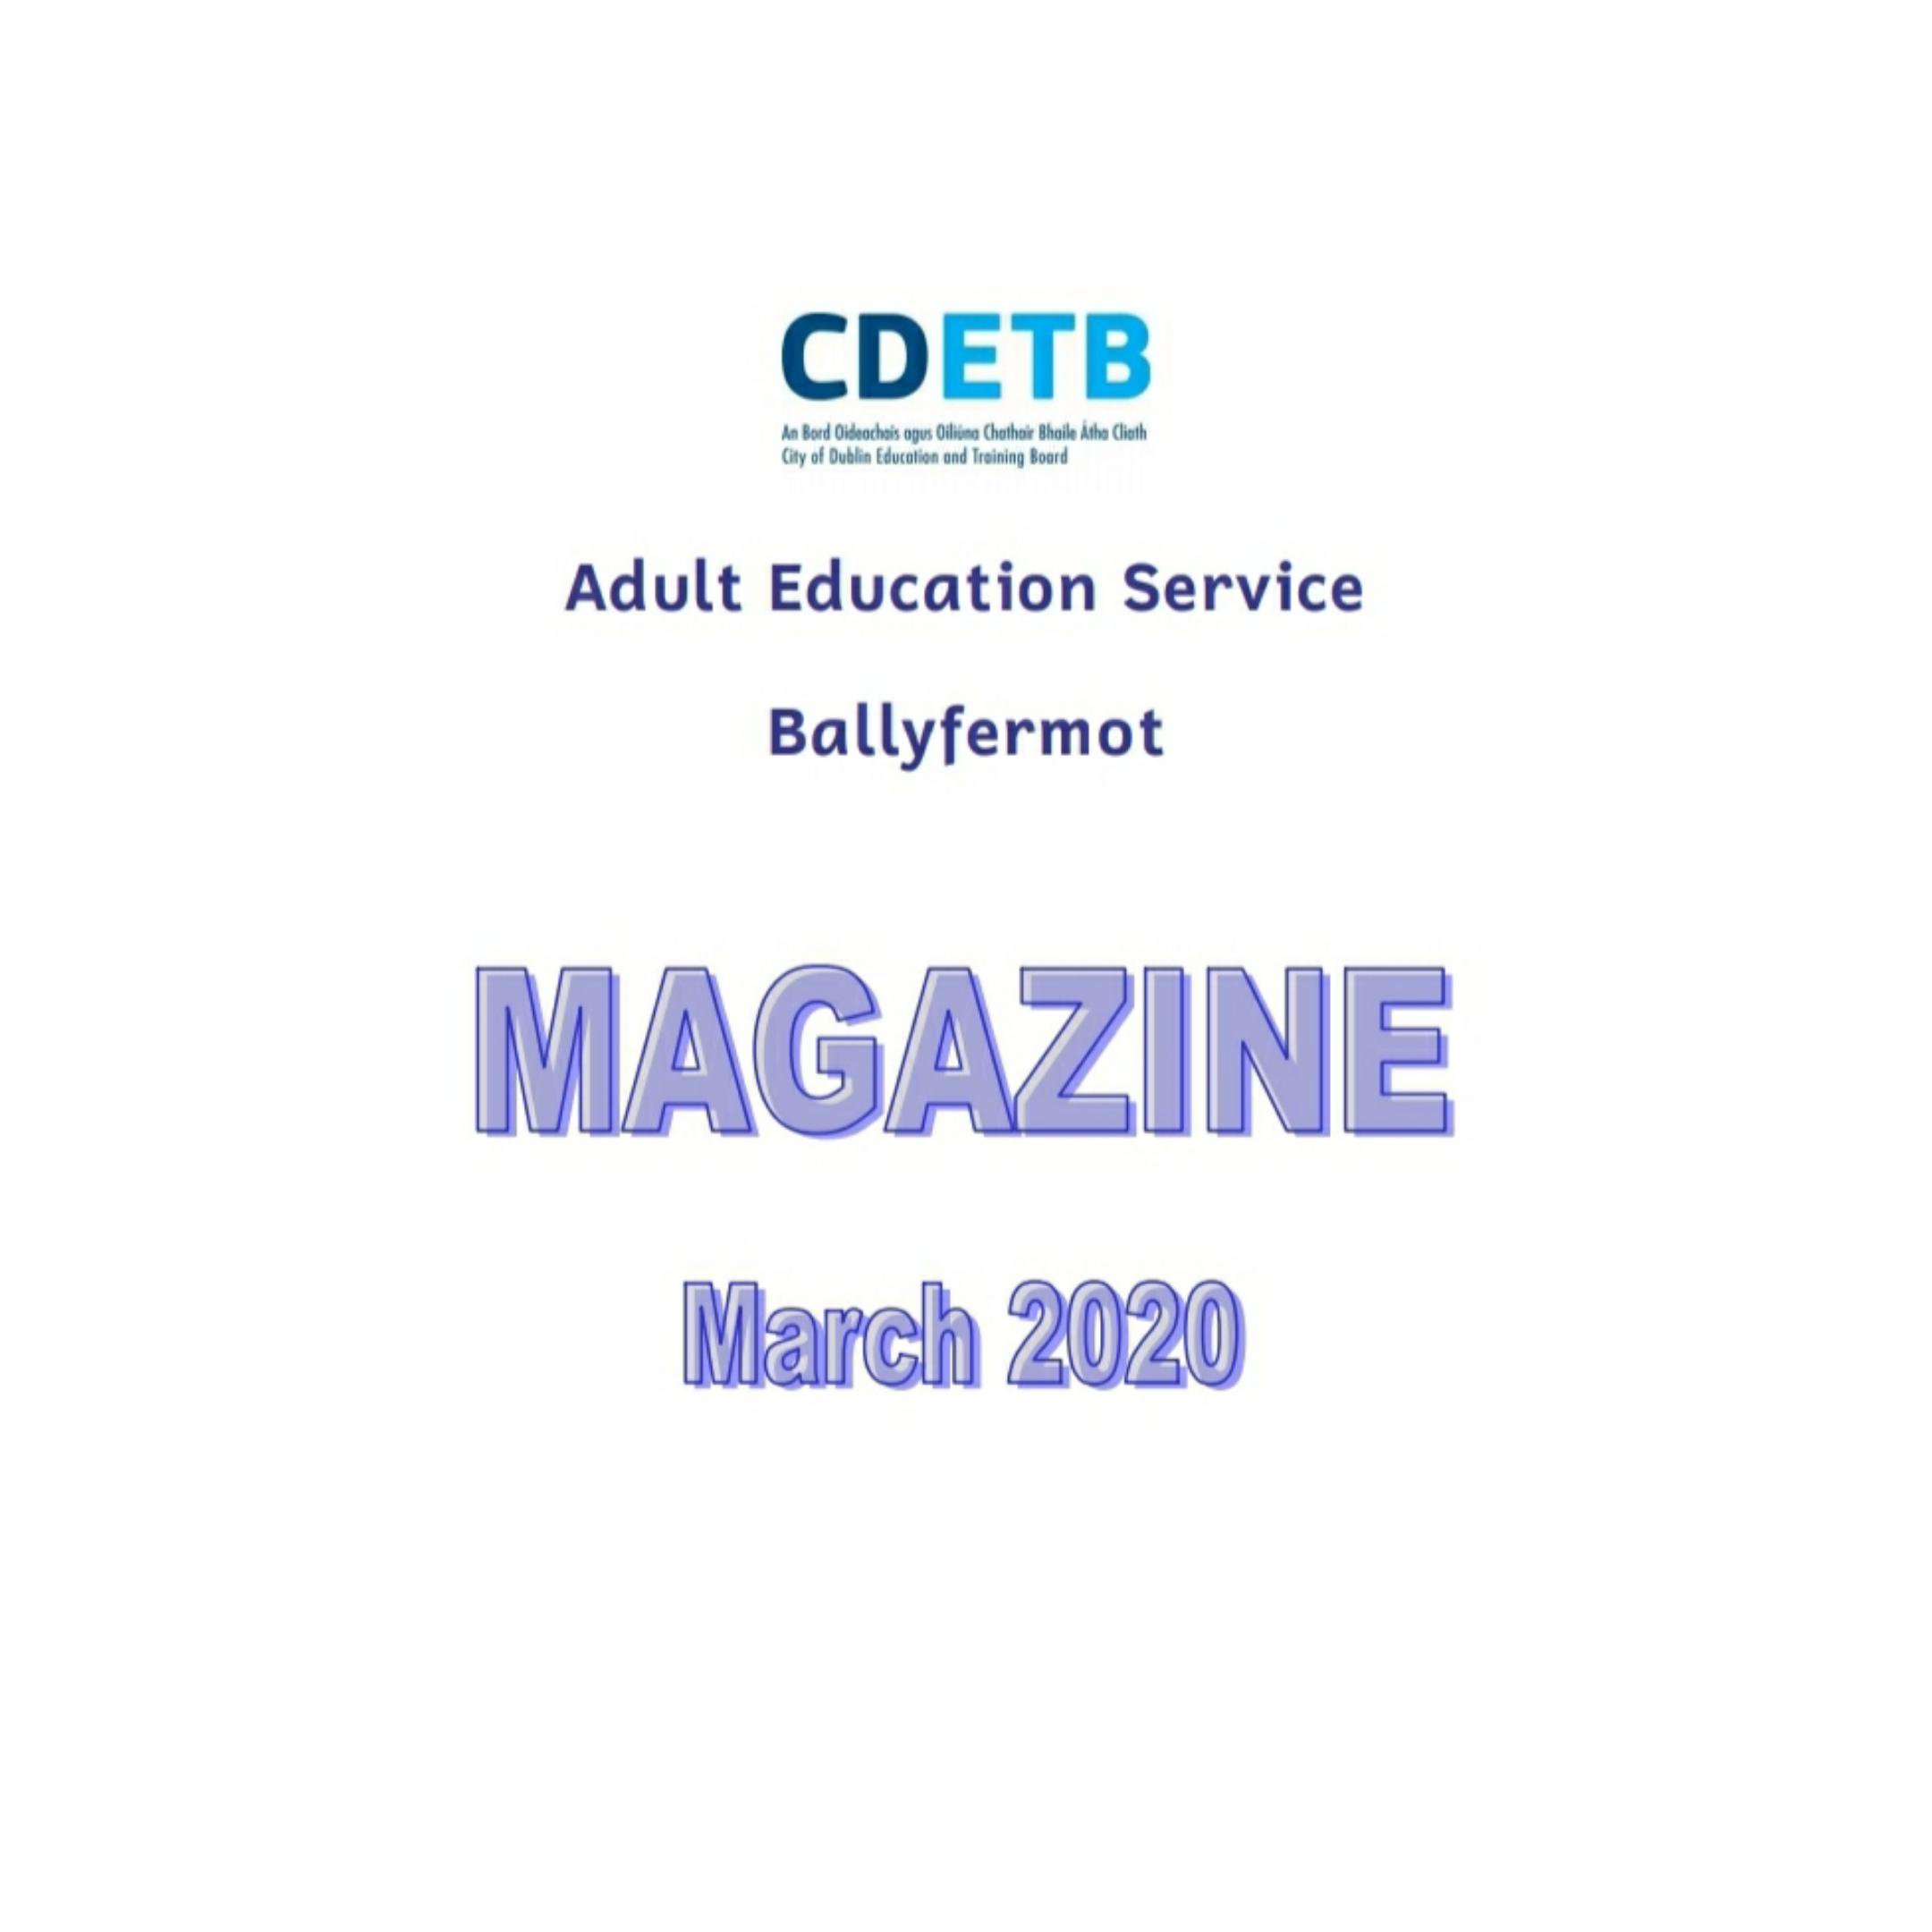 Ballyfermot Magazine March 2020